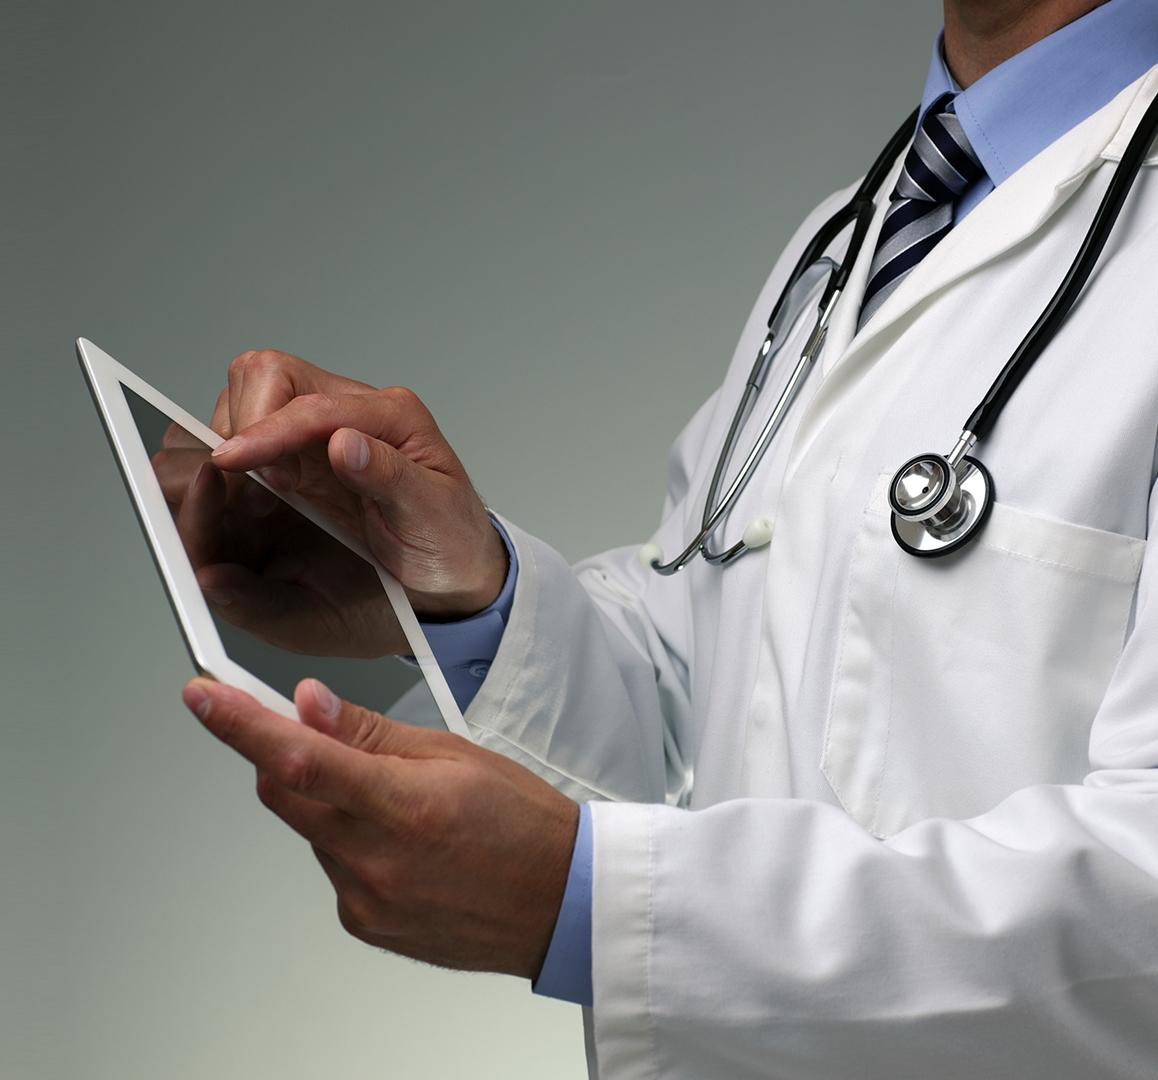 Dr. Sintomas